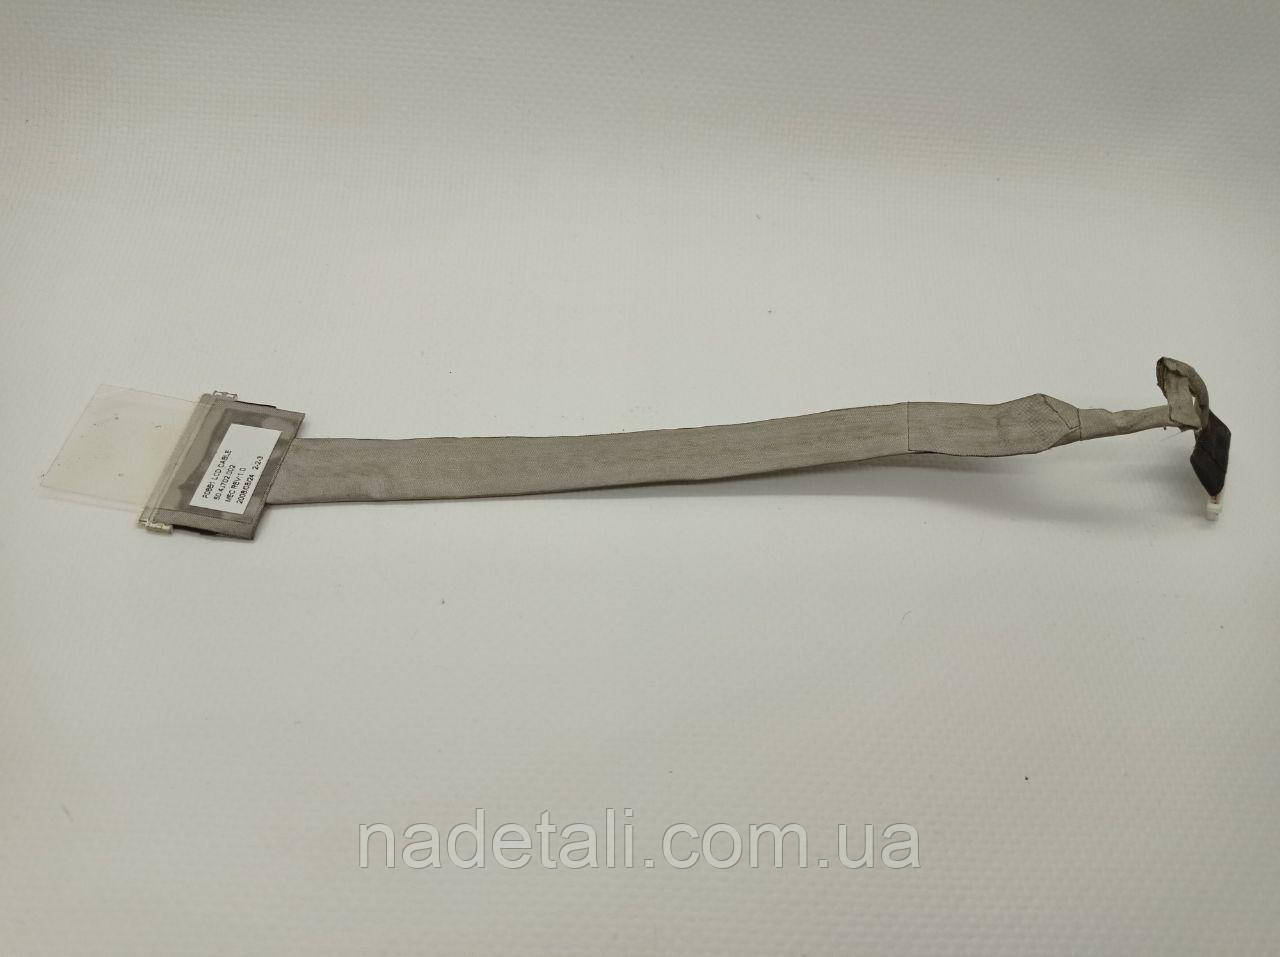 Шлейф матрицы Packard Bell Etna-GM 50.4J702.002